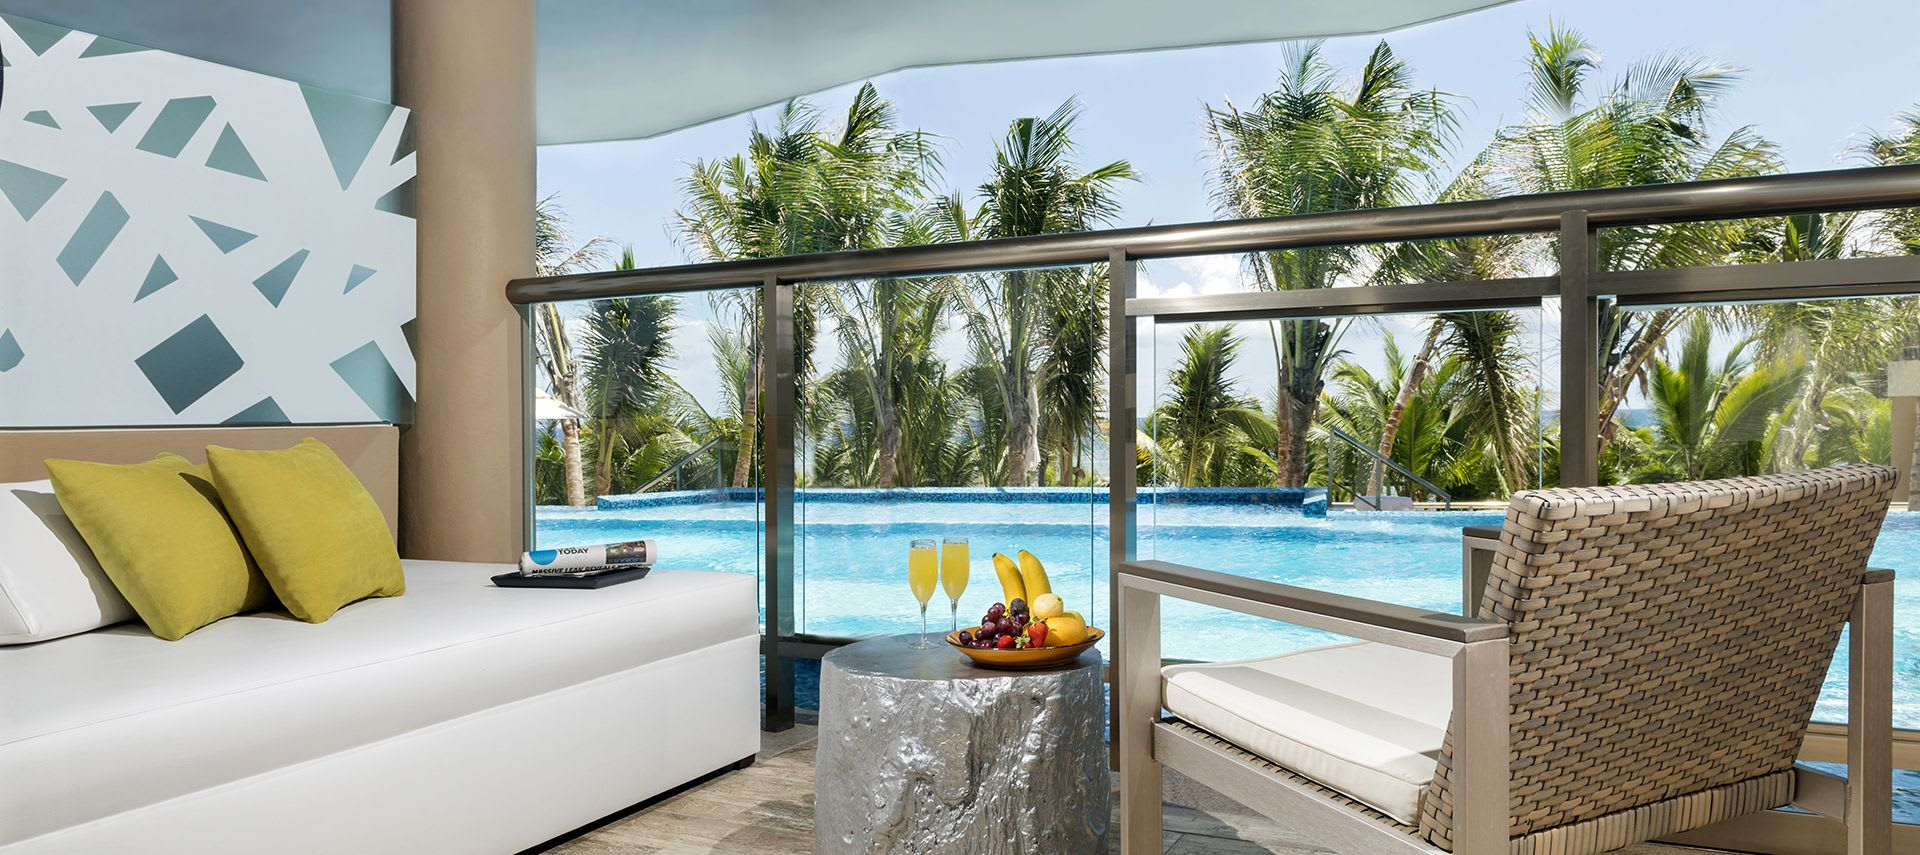 Balcony with pool